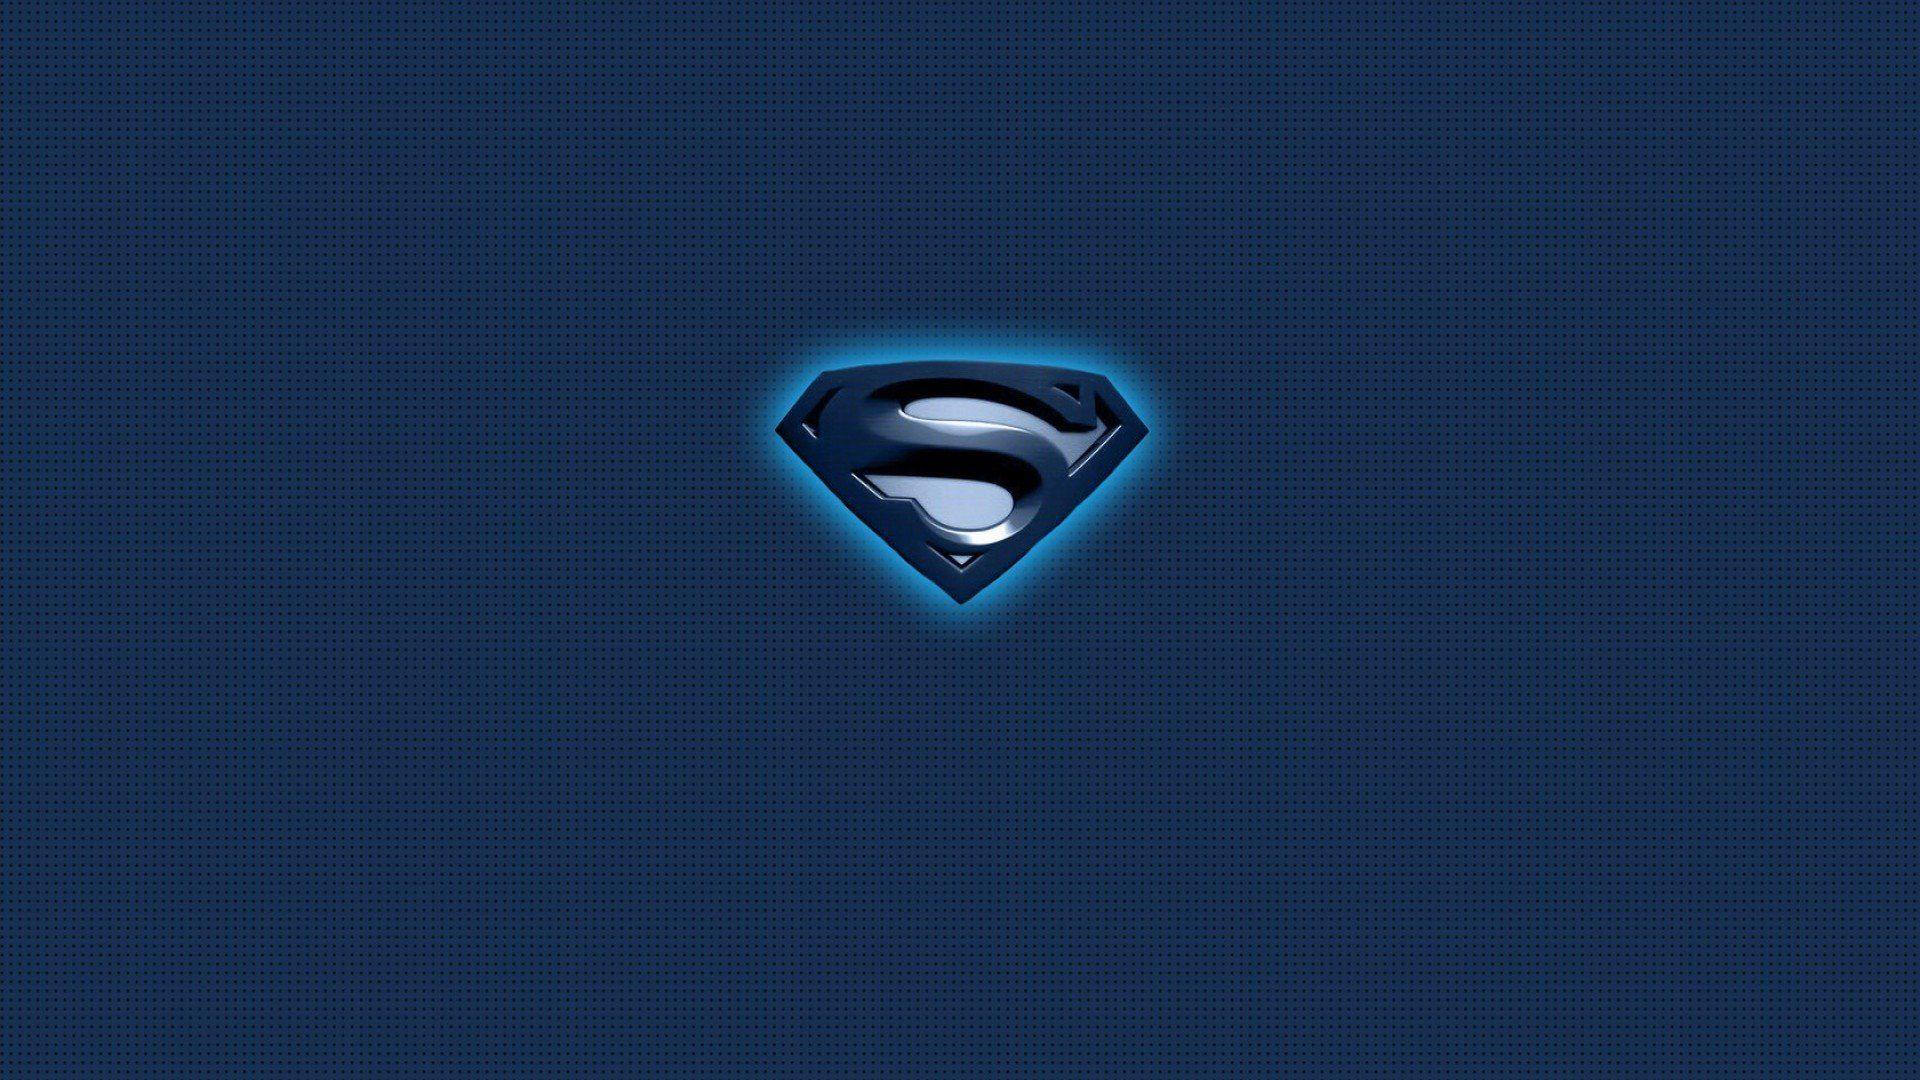 Superman Logo Blue Wallpaper